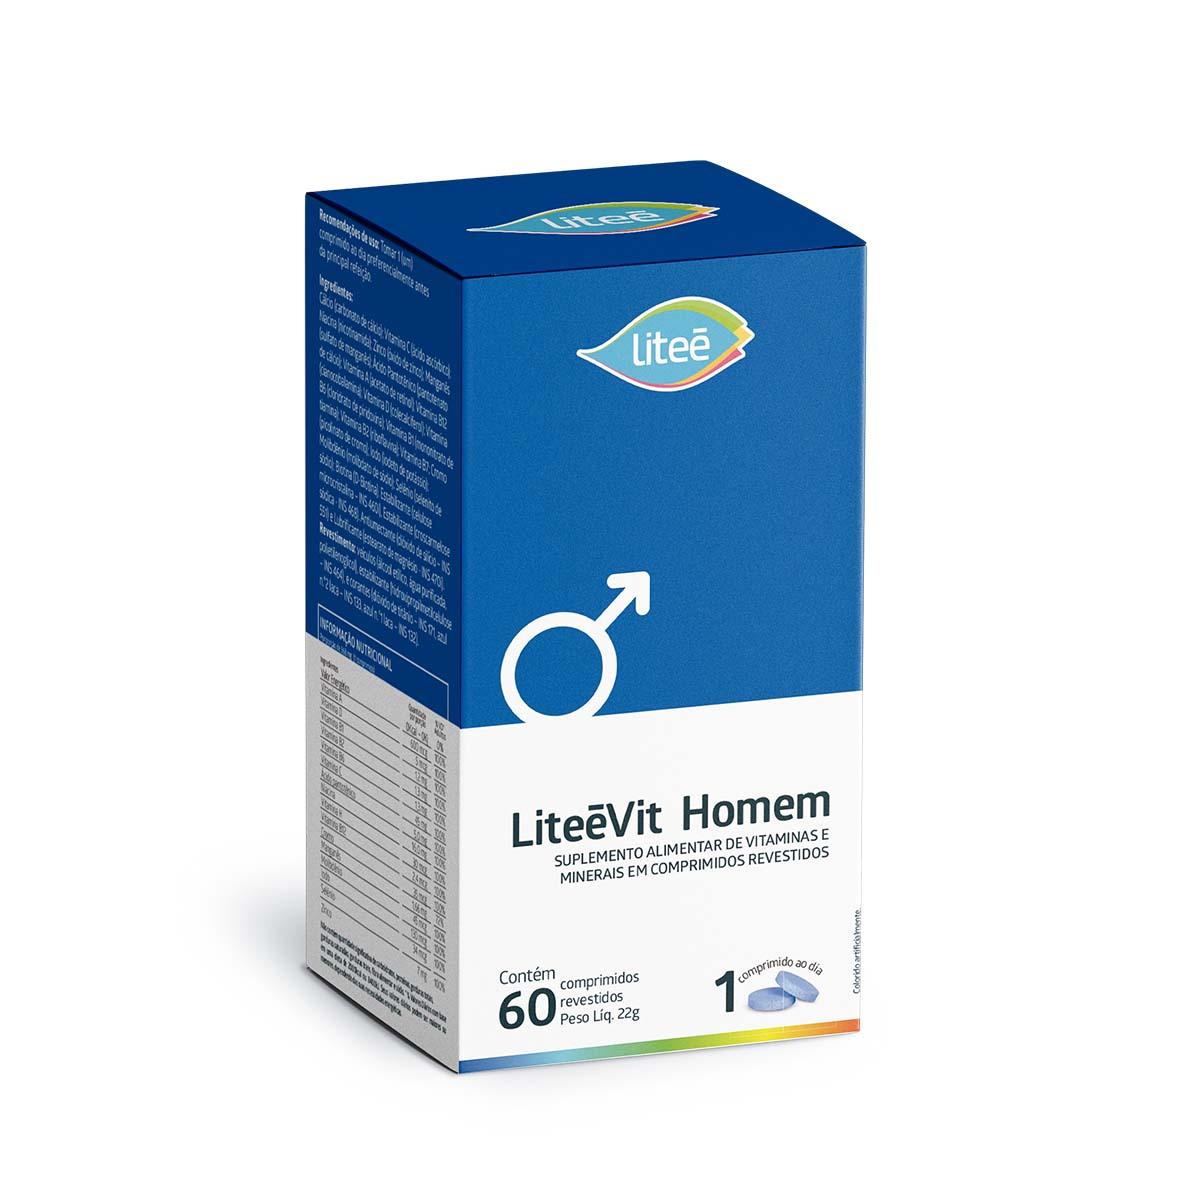 Multivitamínico LiteéVit Homem - 60 comprimidos